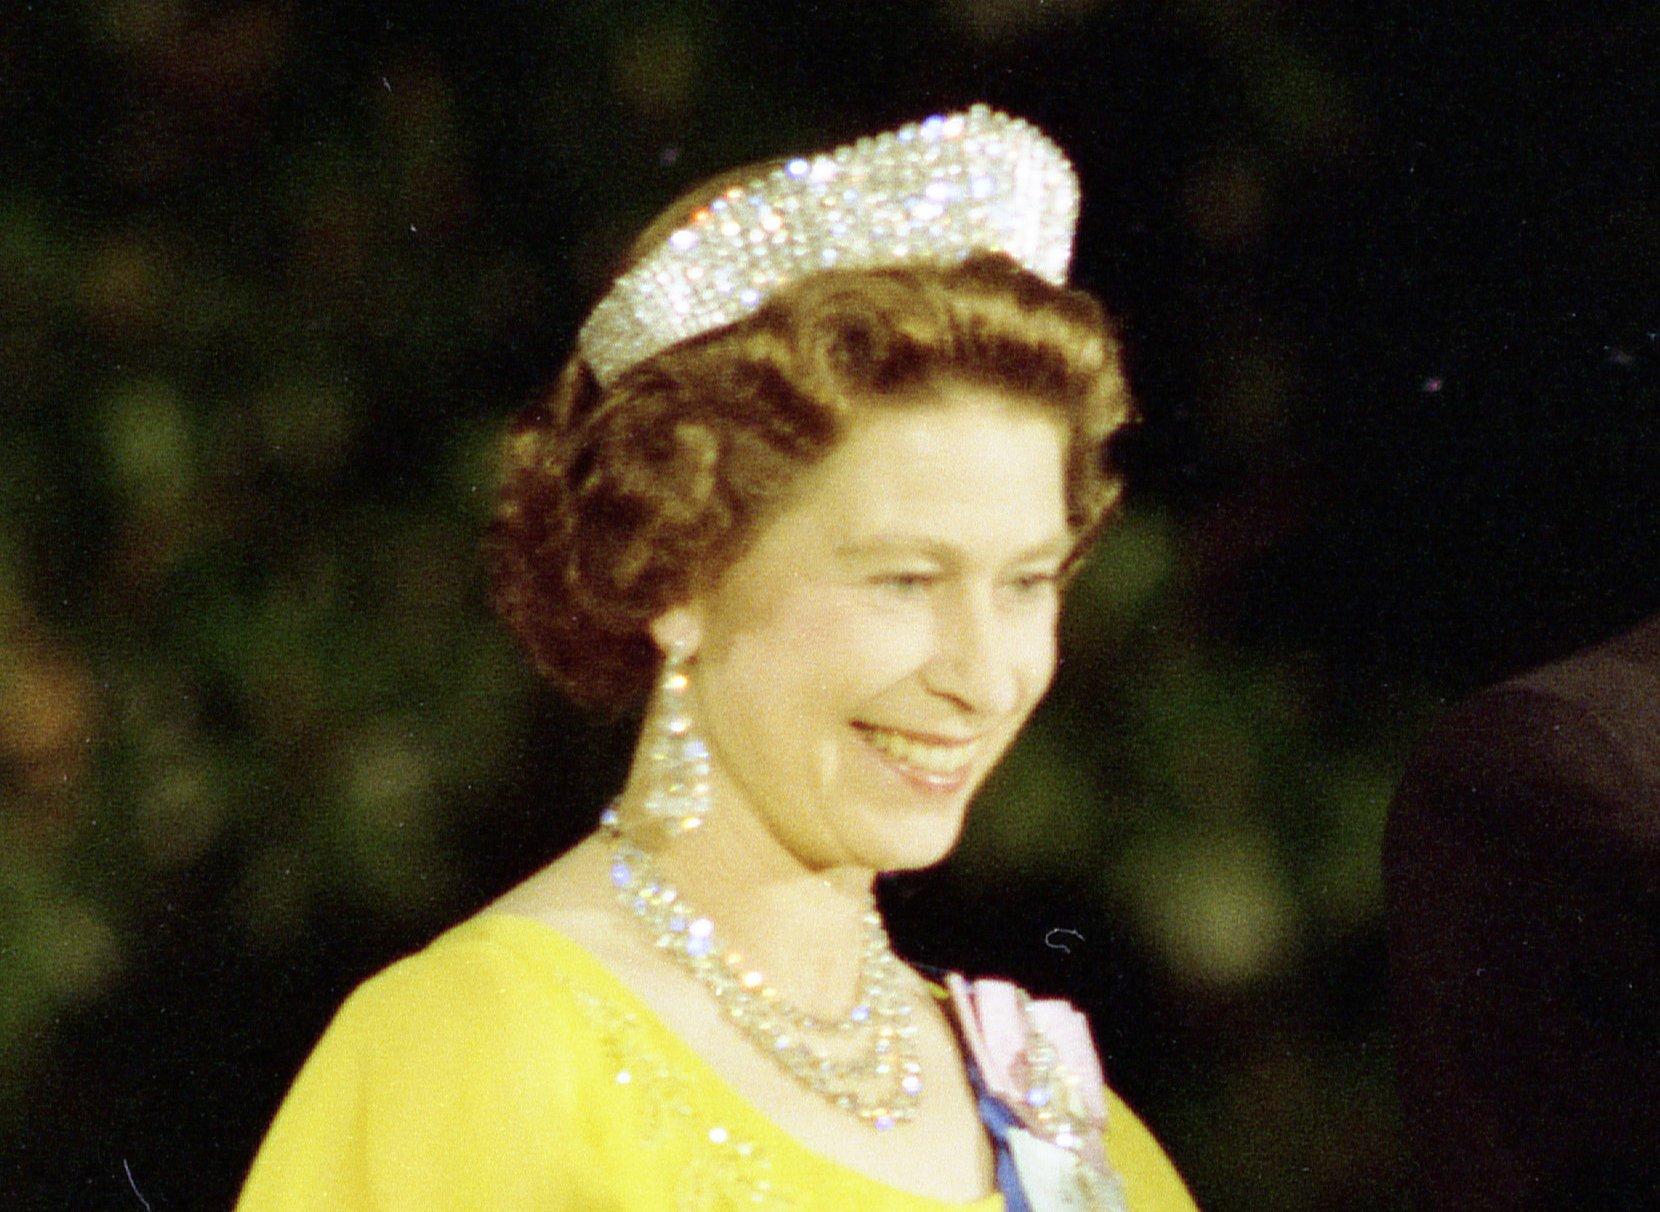 Queen Elizabeth II attends a state dinner in Washington, 1976